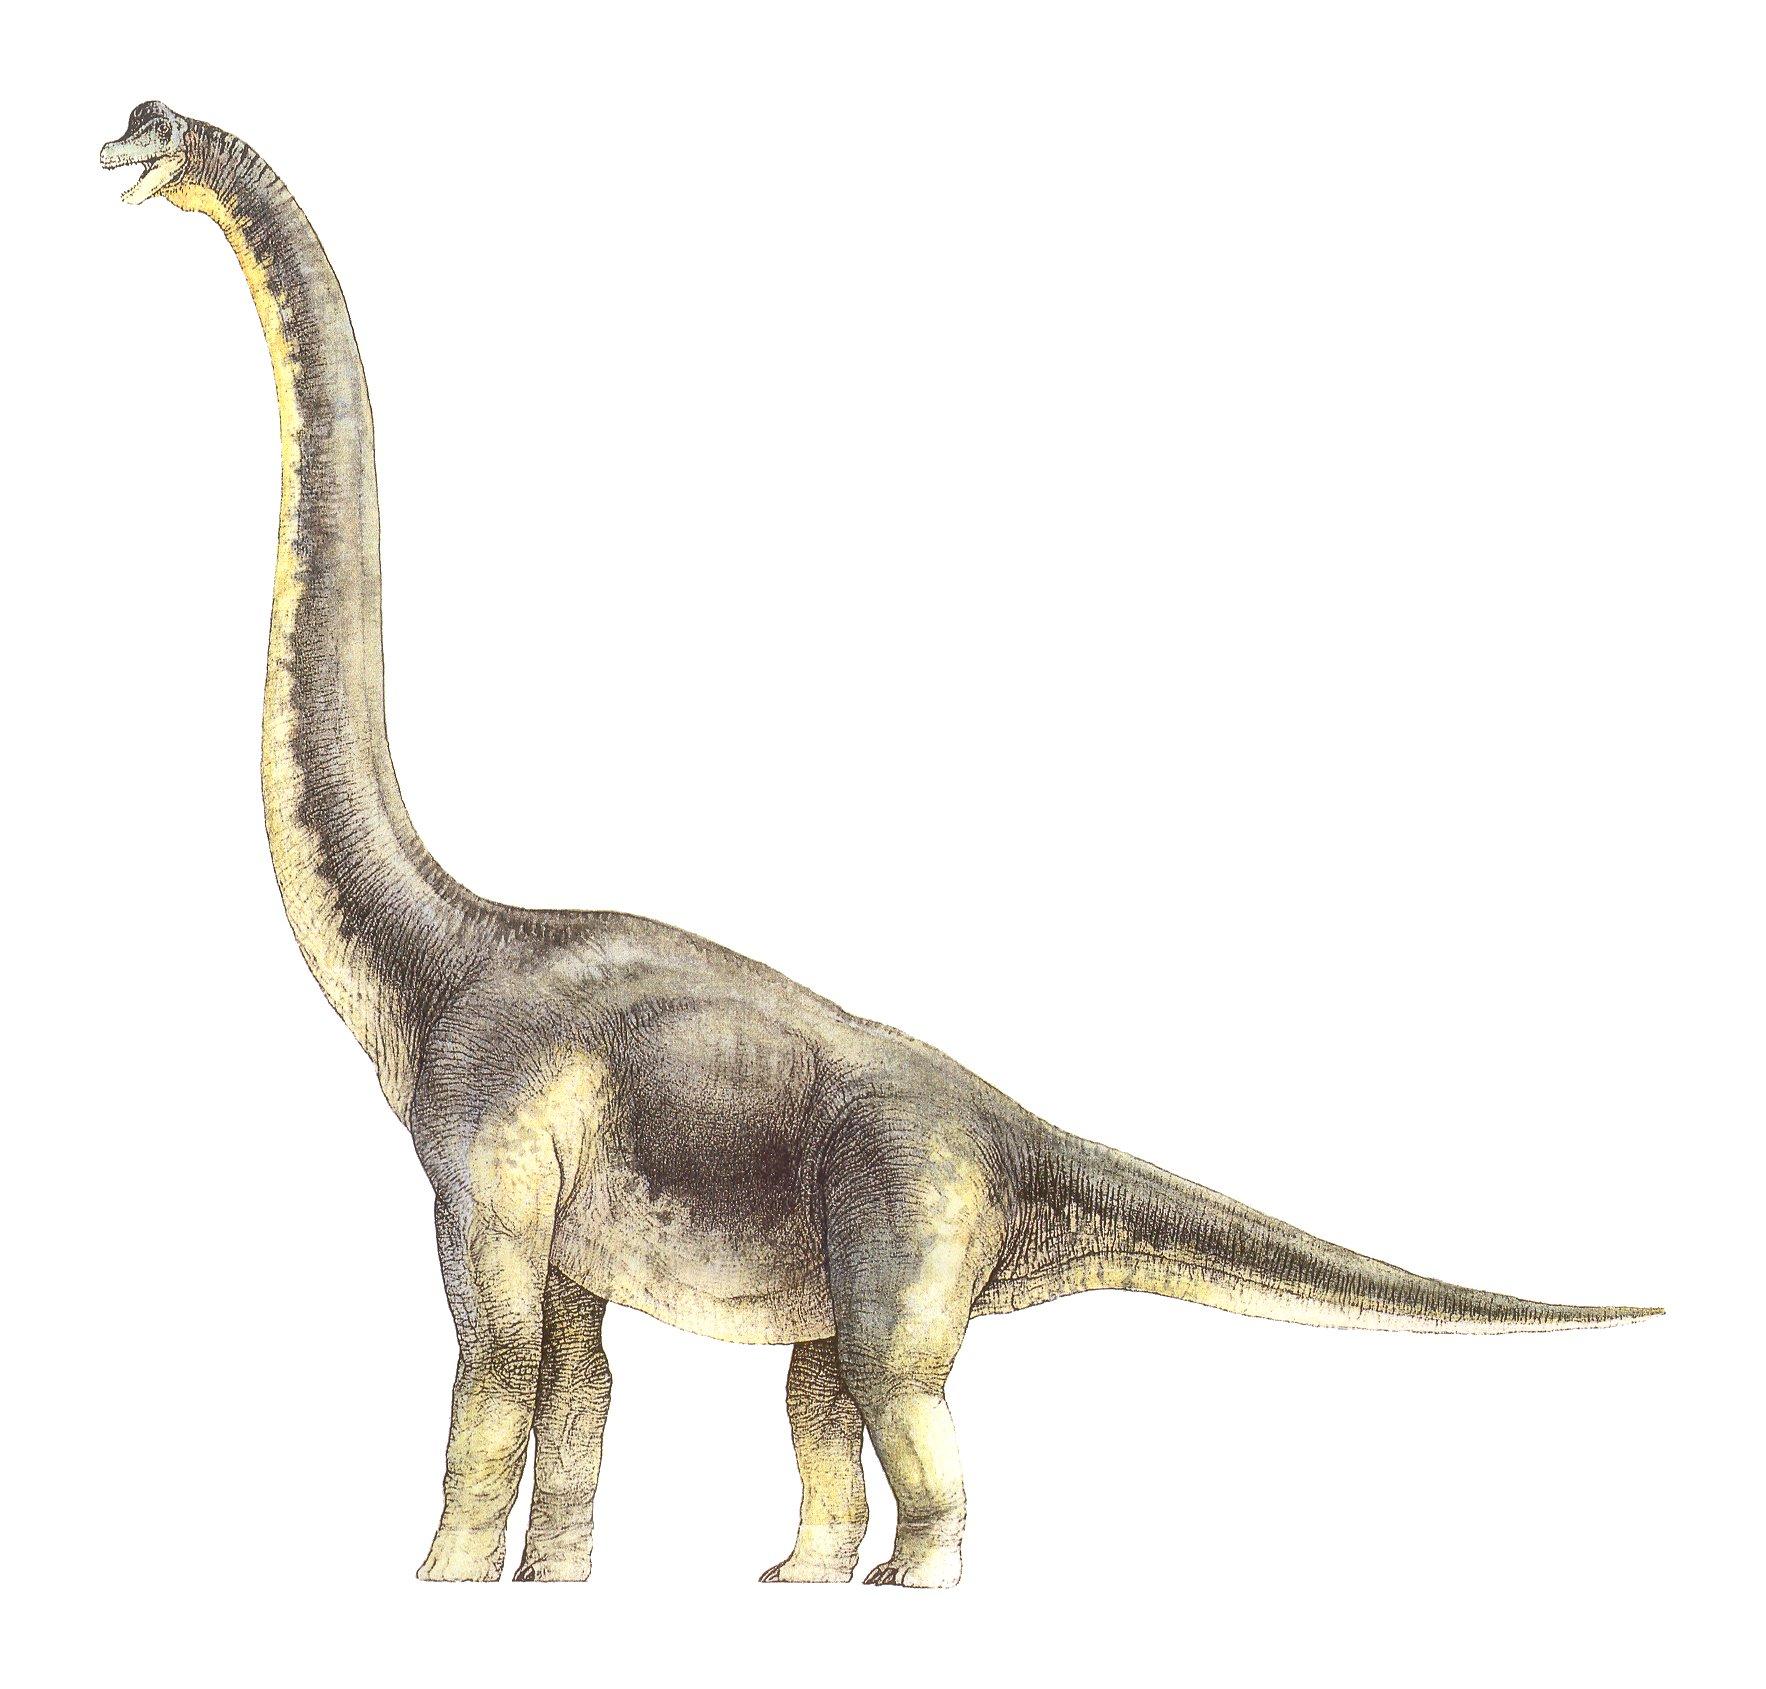 Brachiosaurus clipart extinct And Brachiosaurus tails Brachiosaurus Brazo)